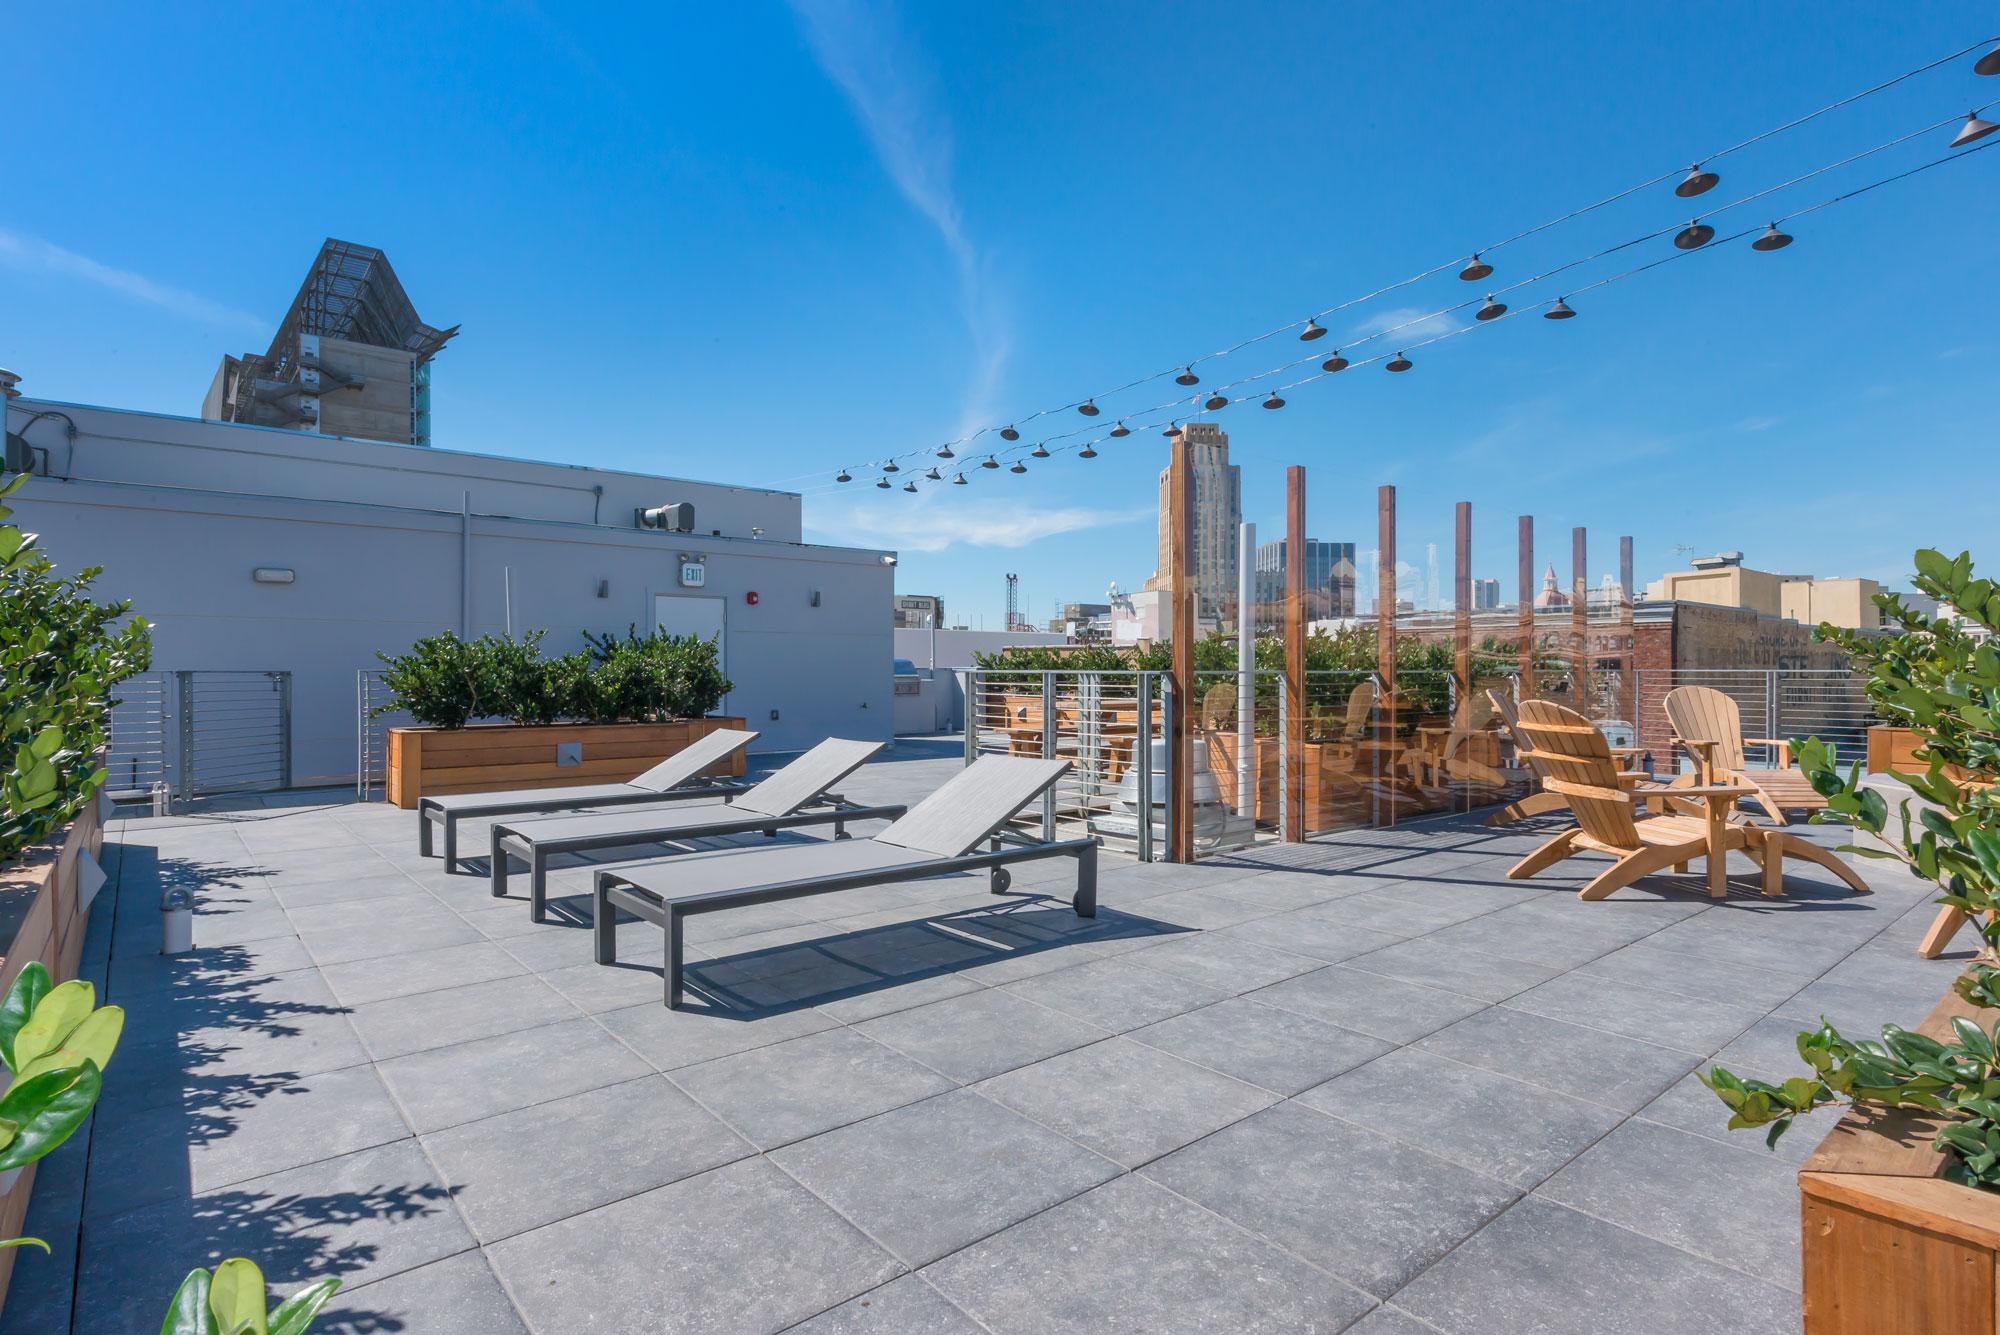 roof-3.jpg